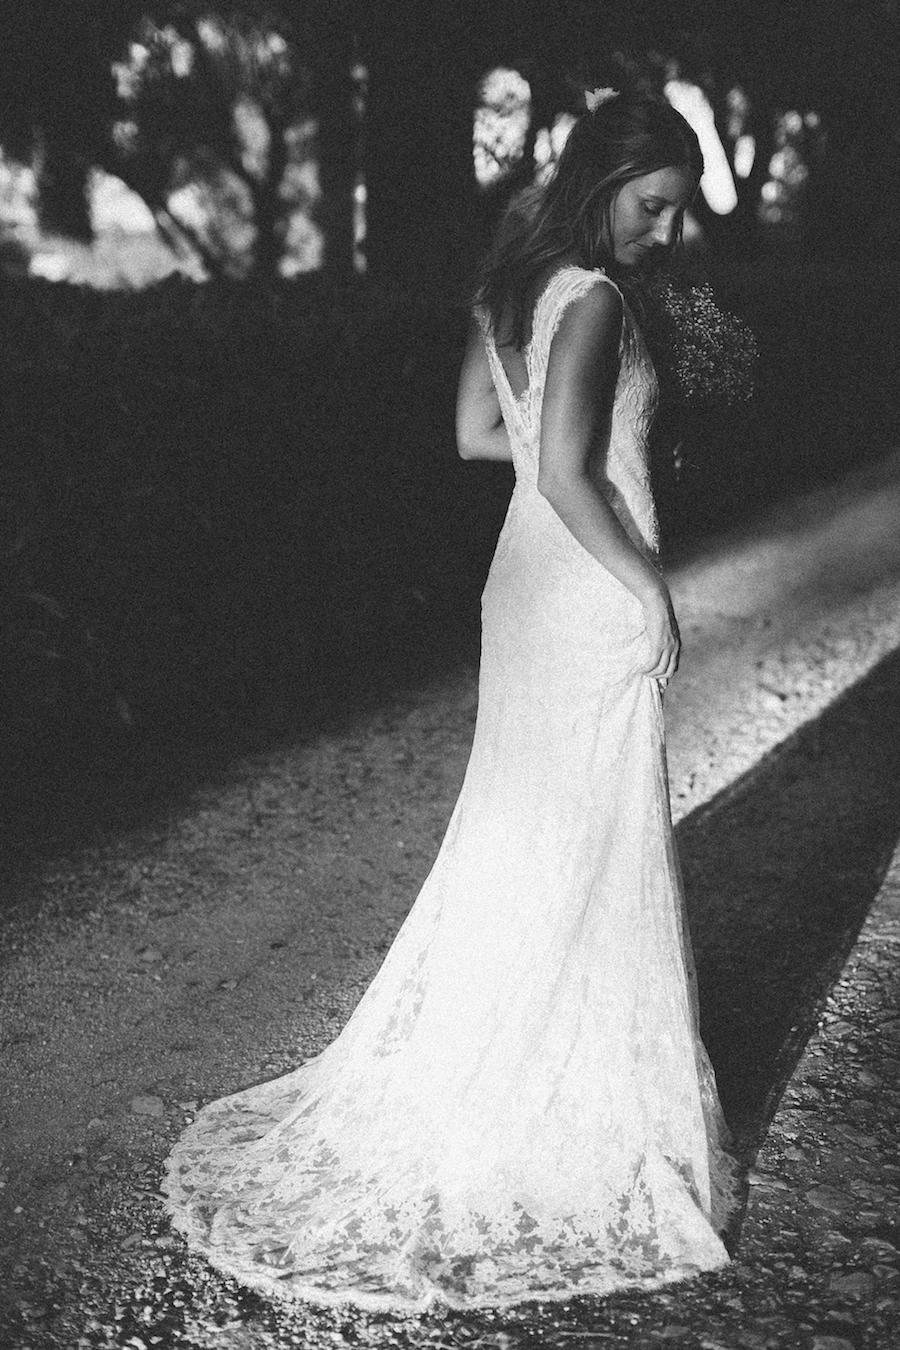 saya-photography-wedding-french-riviera-rustic-antibes-la-bastide-du-roy-88.jpg